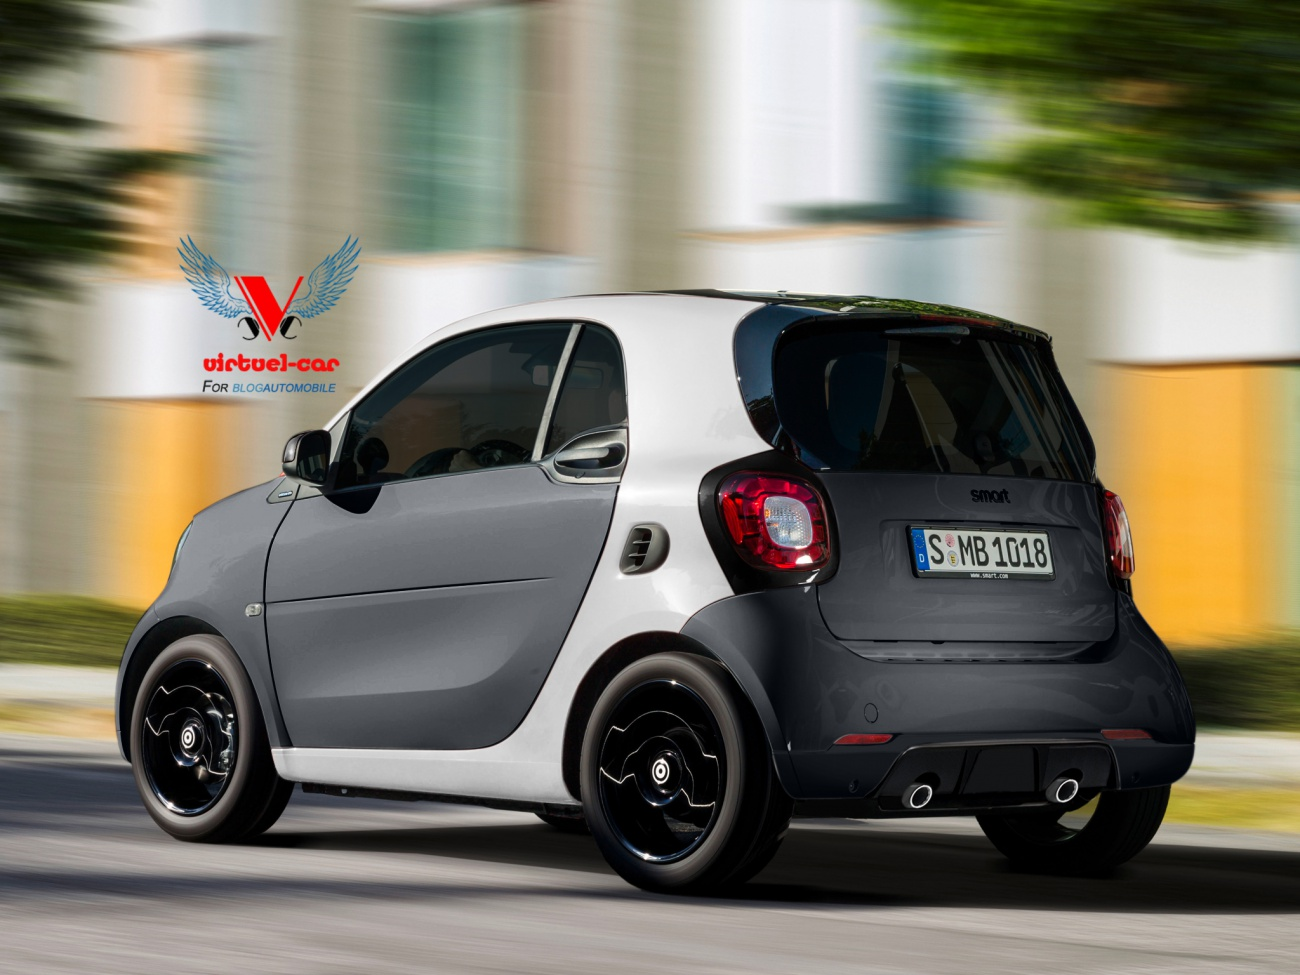 smart brabus 2015 en approche blog automobilesmart brabus arriere